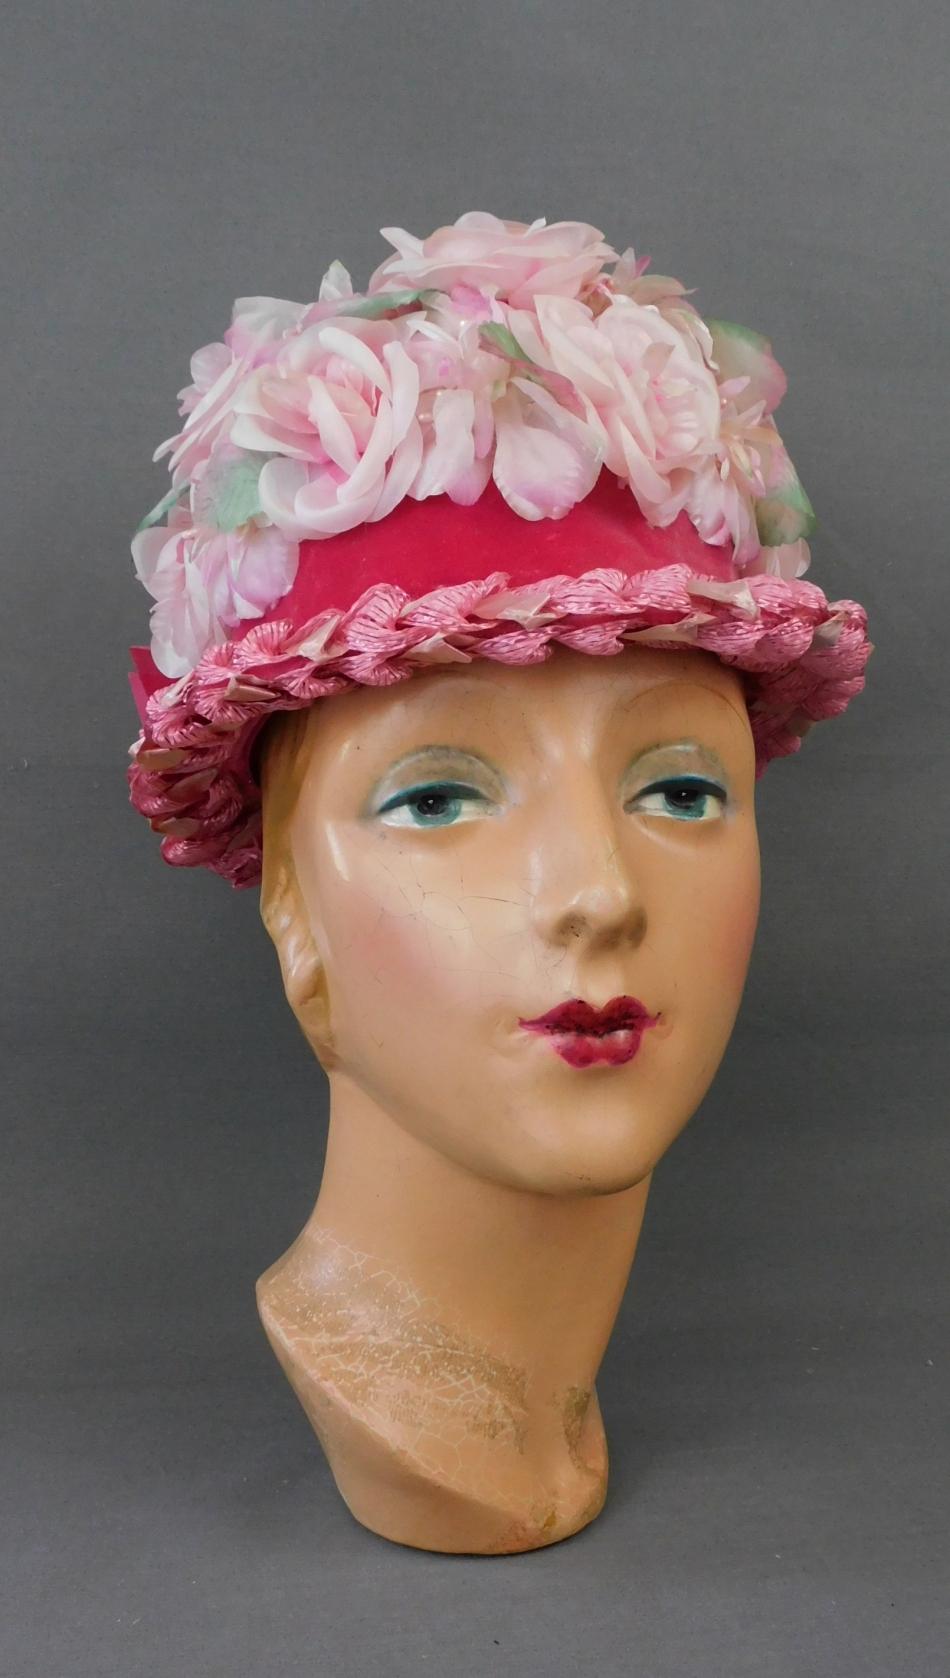 Vintage Pink Floral Straw Hat with Velvet Ribbon 1960s